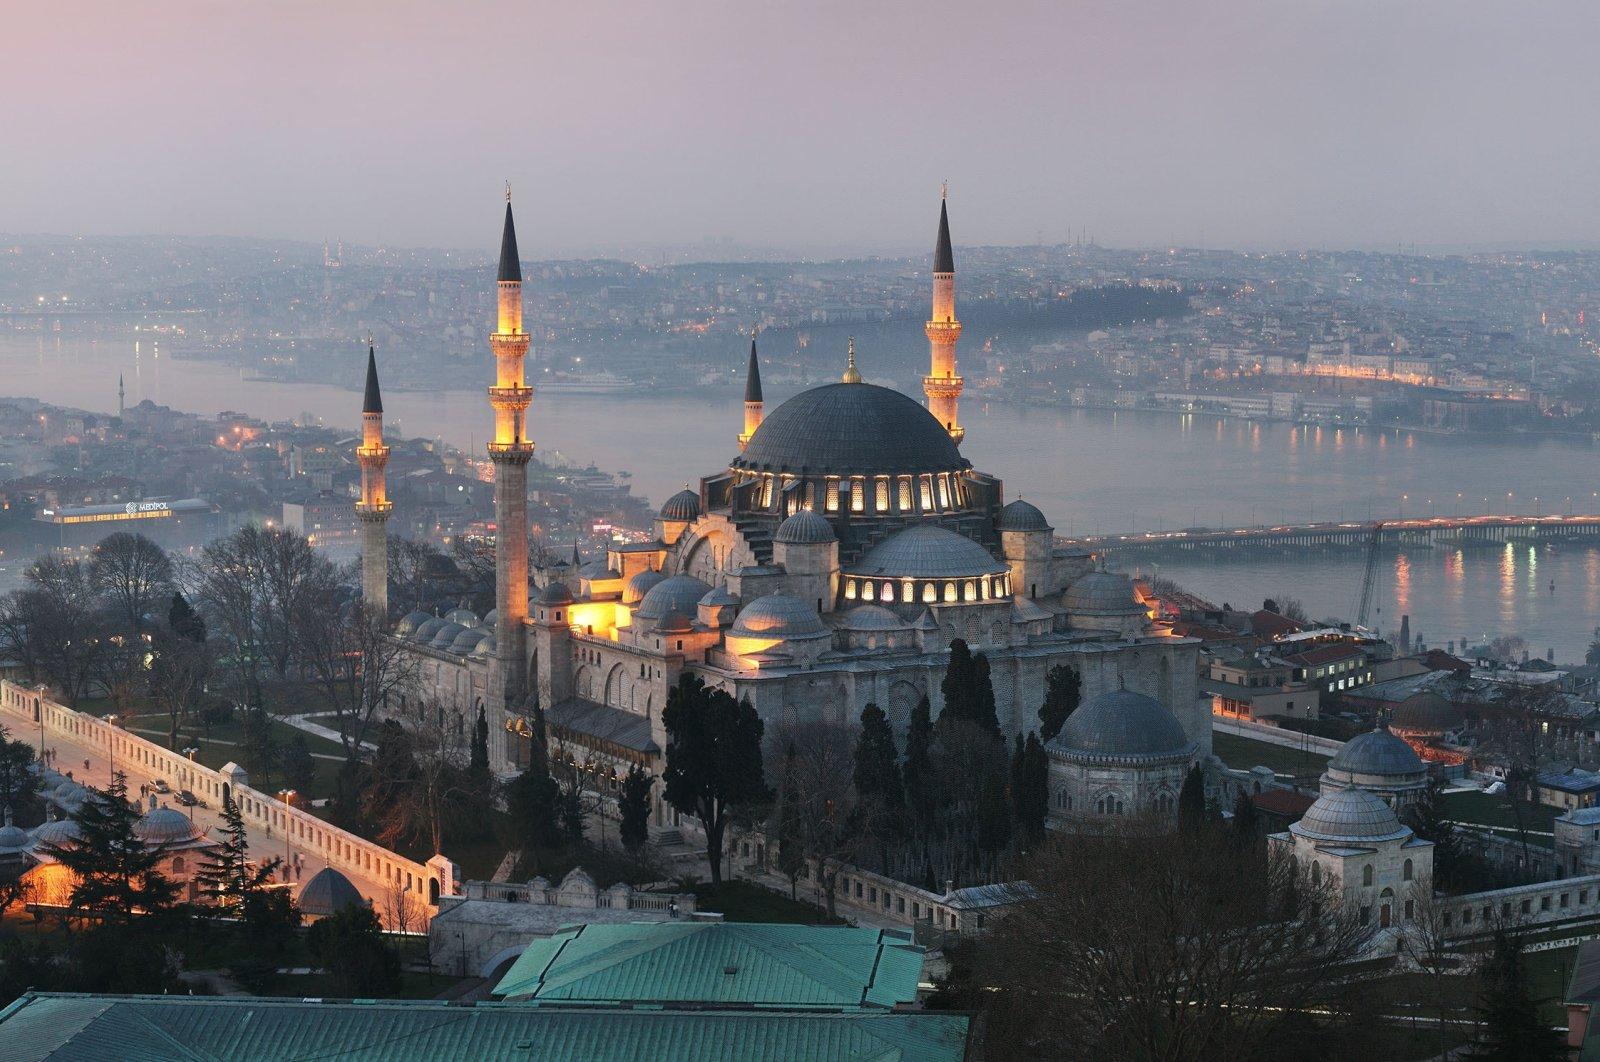 Süleymaniye Mosque, Istanbul, Turkey. (Shutterstock Photo)